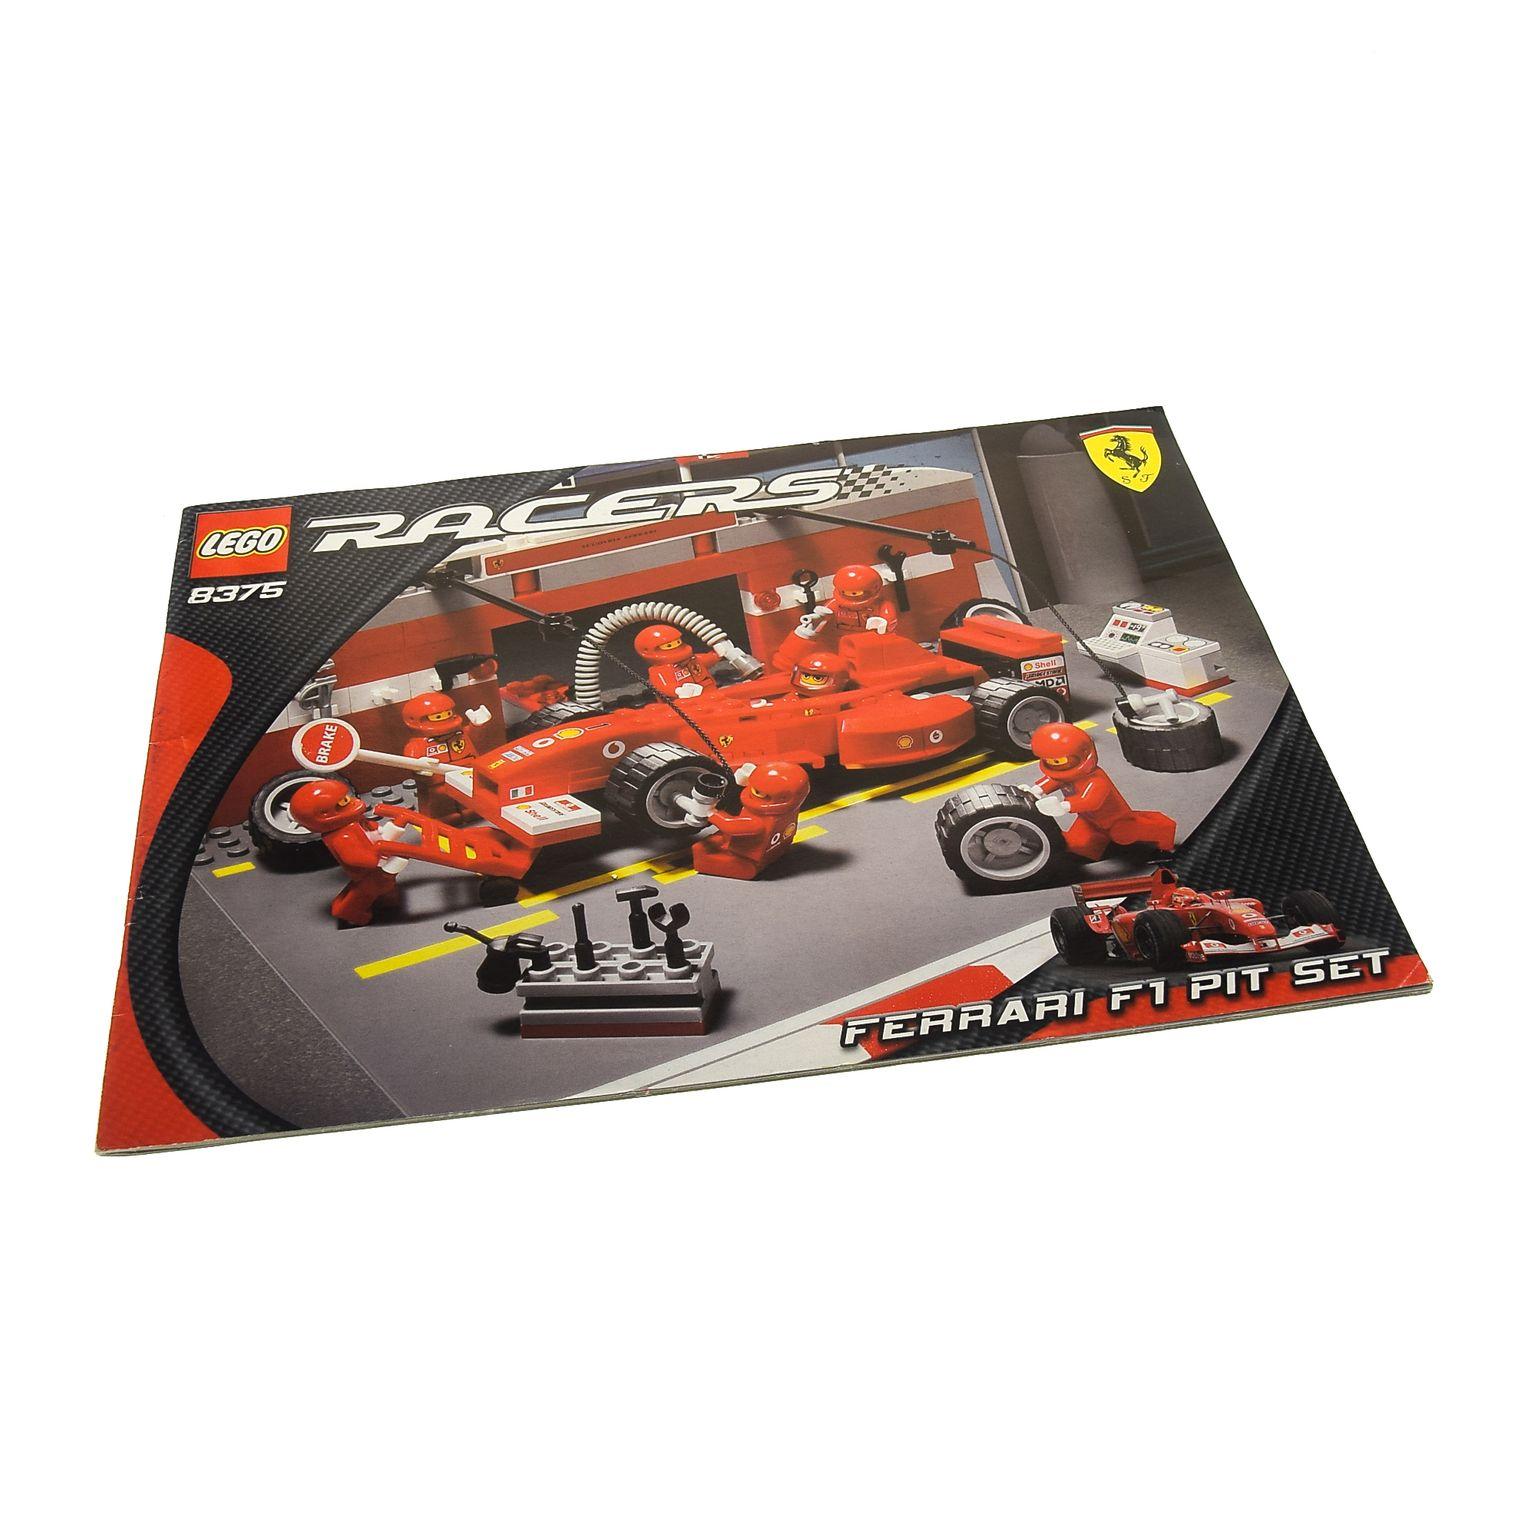 1 x lego system bauanleitung a4 racers ferrari f1 pit boxen stop rennwagen set 8375. Black Bedroom Furniture Sets. Home Design Ideas